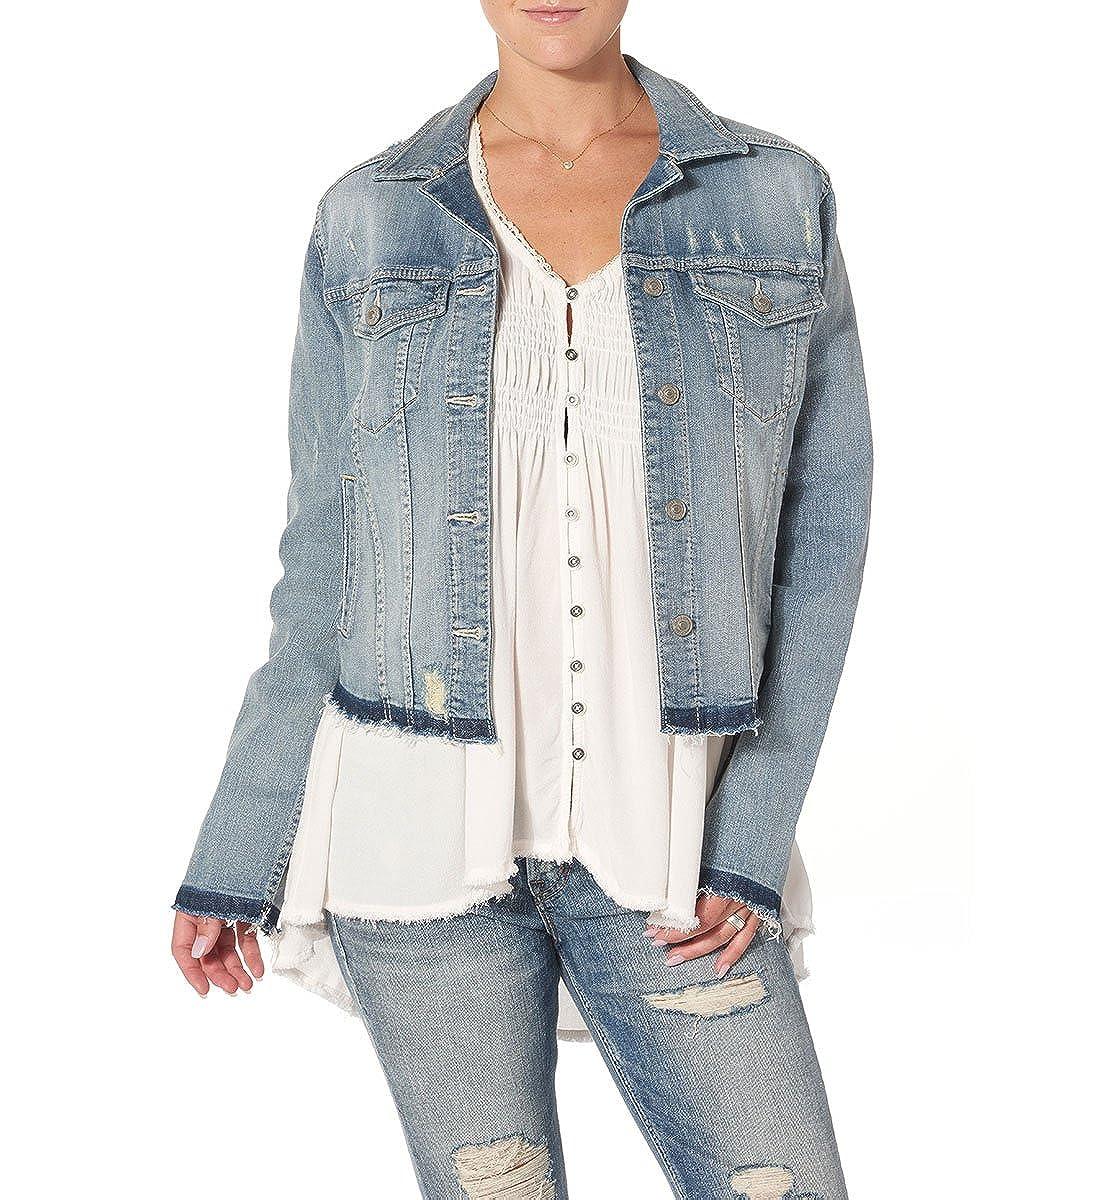 Silver Jeans Women's Denim Jacket with Let Down Destructed Hem Silver Jeans Juniors LJ0013SJL146